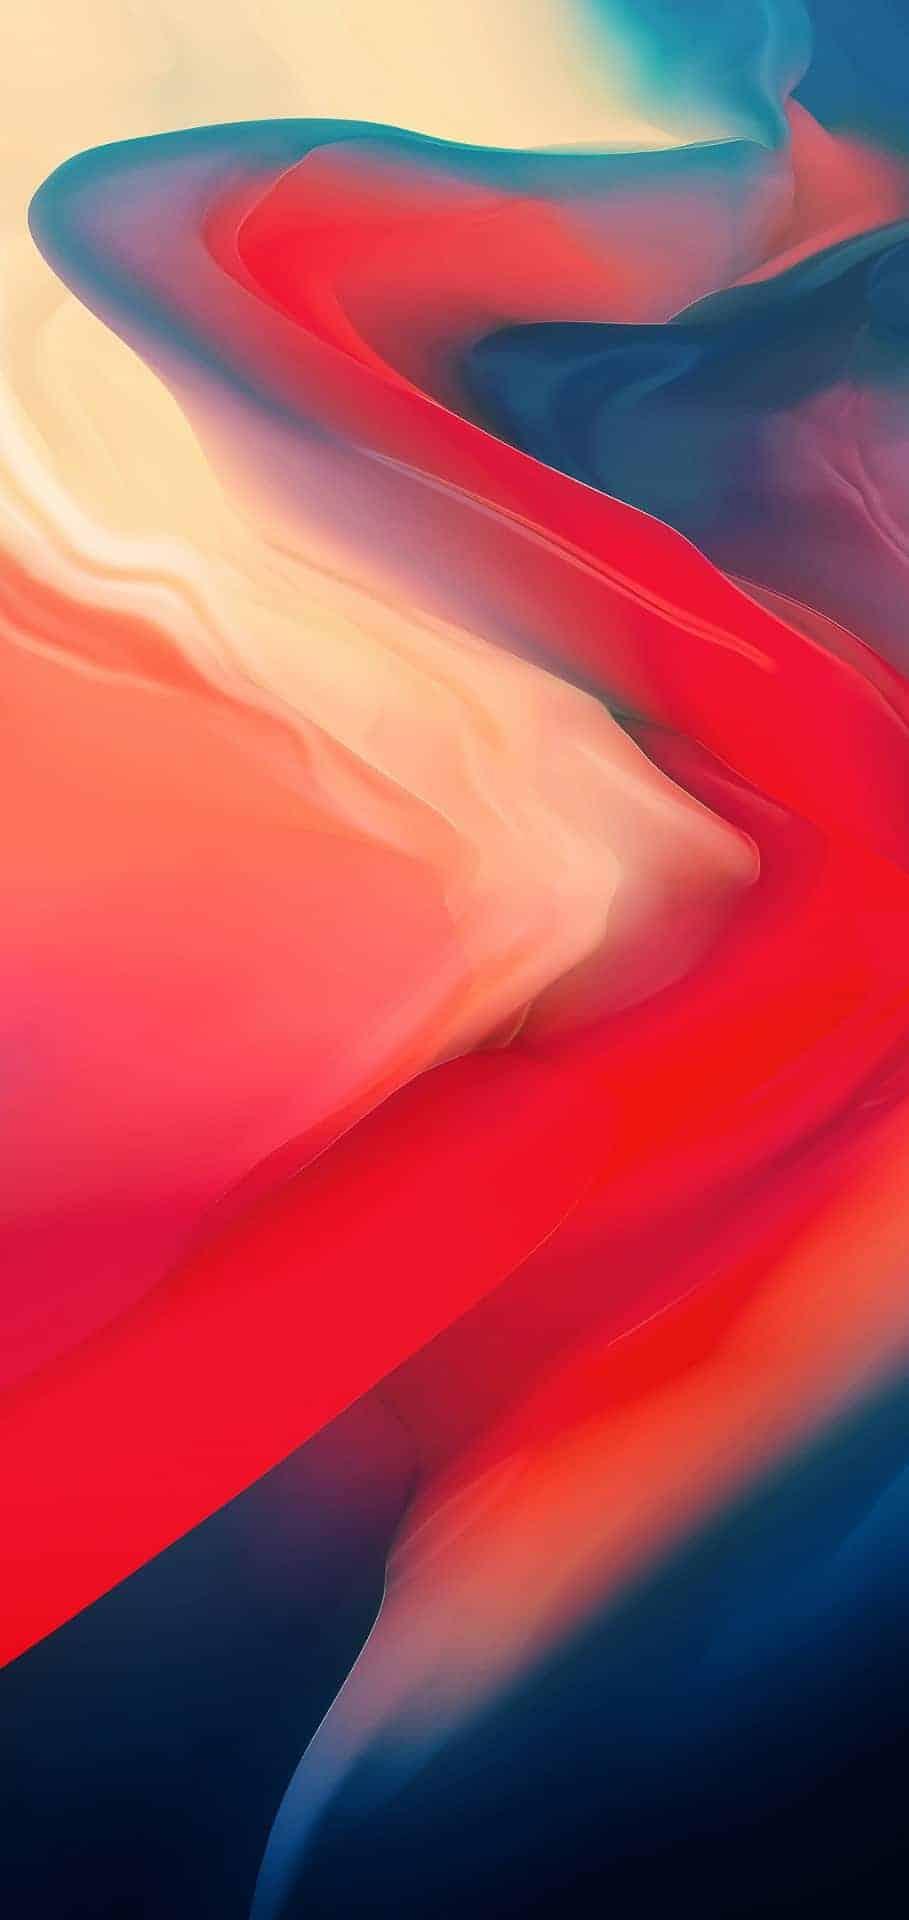 OnePlus 6 official wallpaper 3